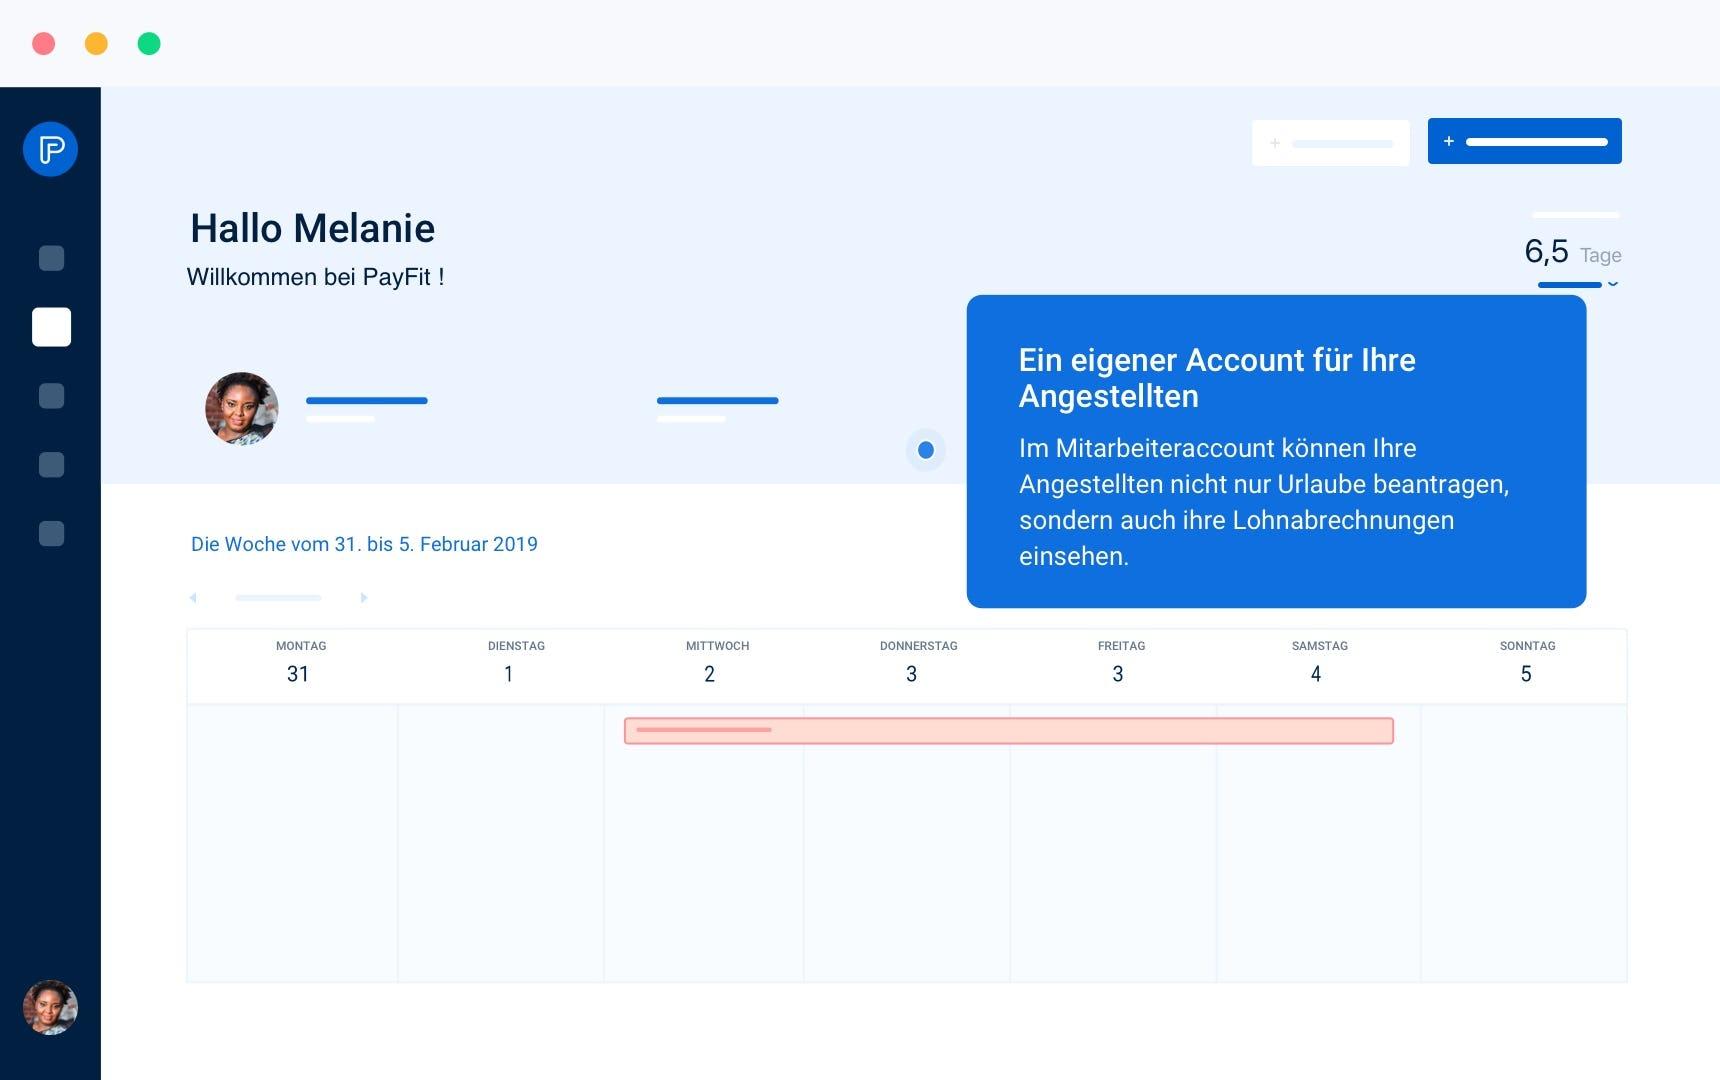 Mitarbeiter-Account